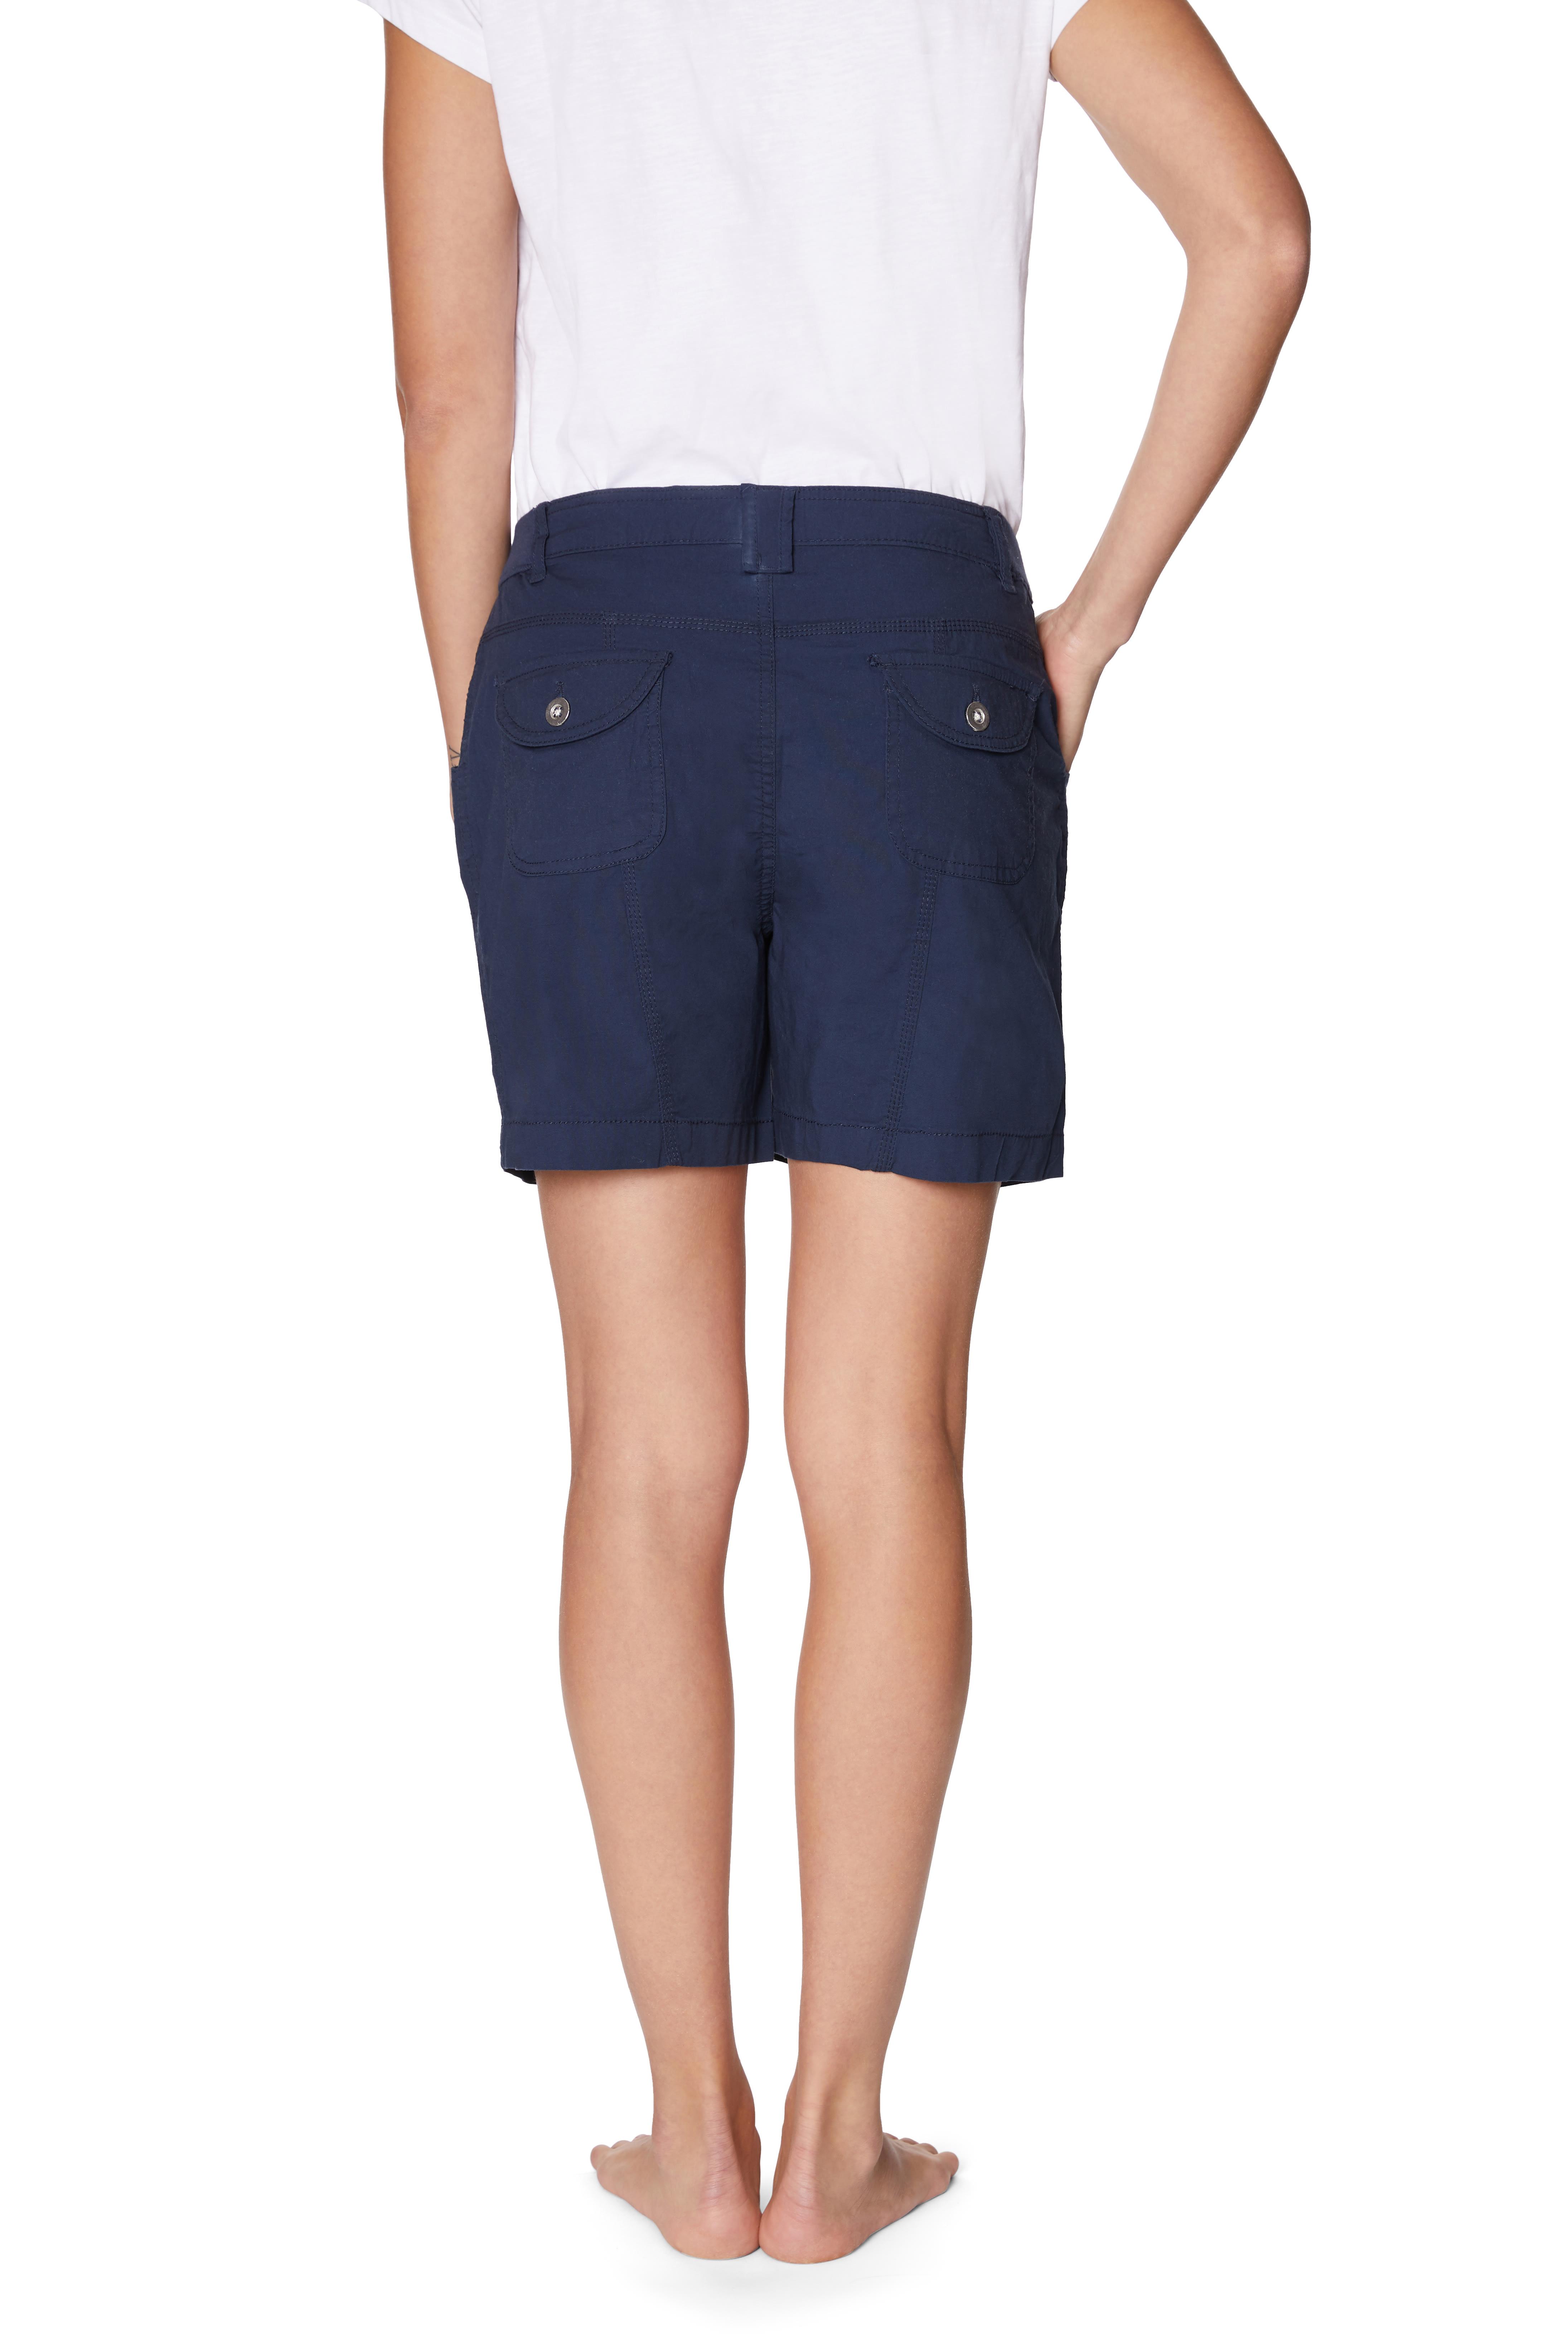 Caribbean Joe® Cotton Short - Navy - Back